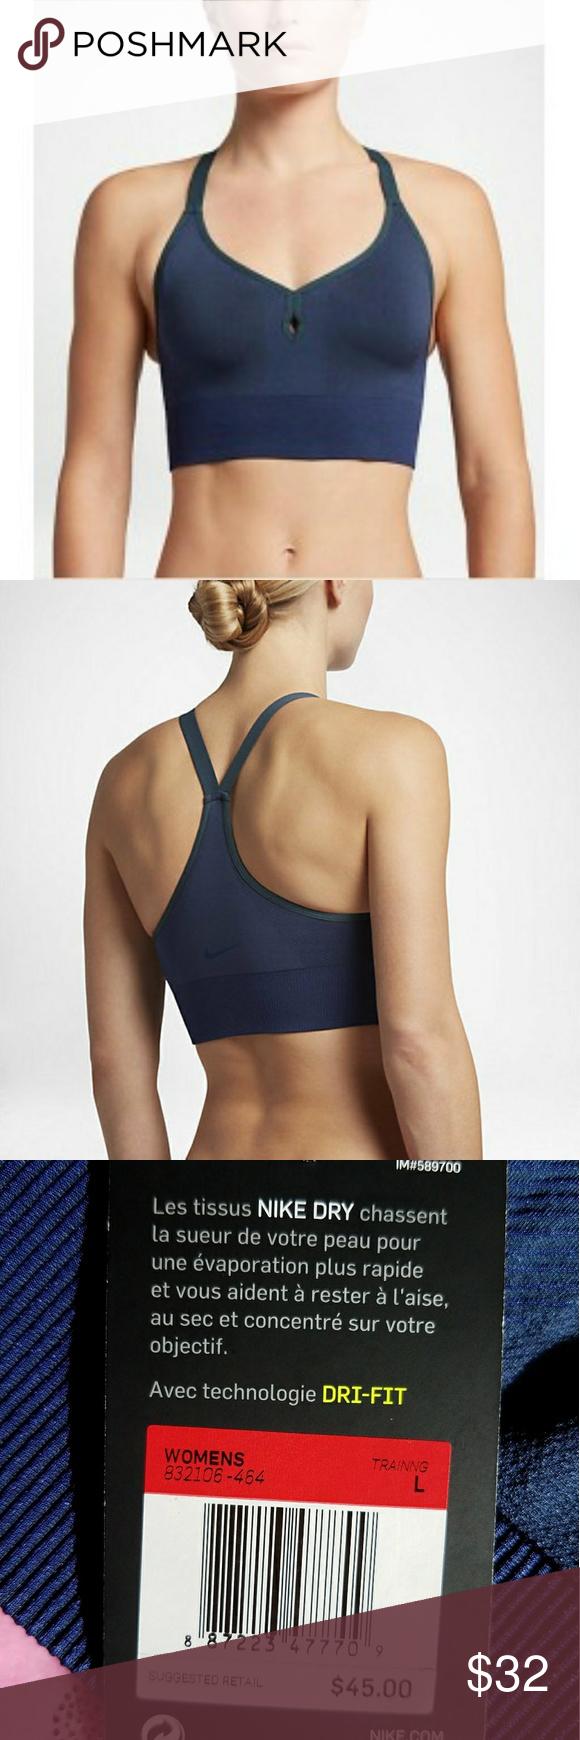 nike seamless bralette brand new nike seamless bralette Training drifit Nike Intimates & Sleepwear Bras